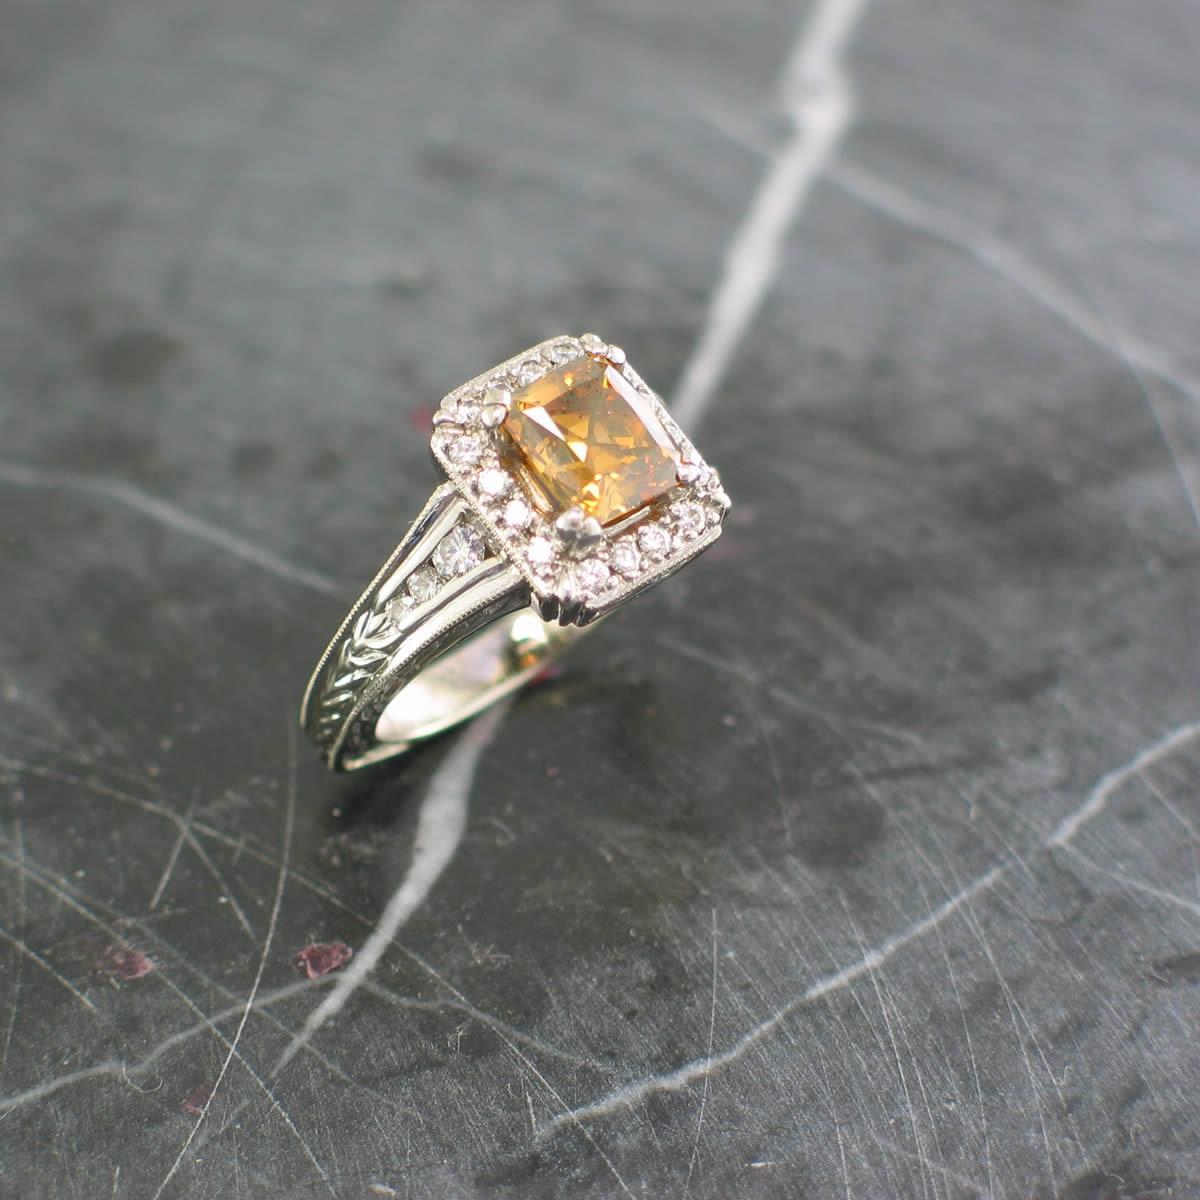 sherburne_jewelers_custom_jewelery_6.jpg